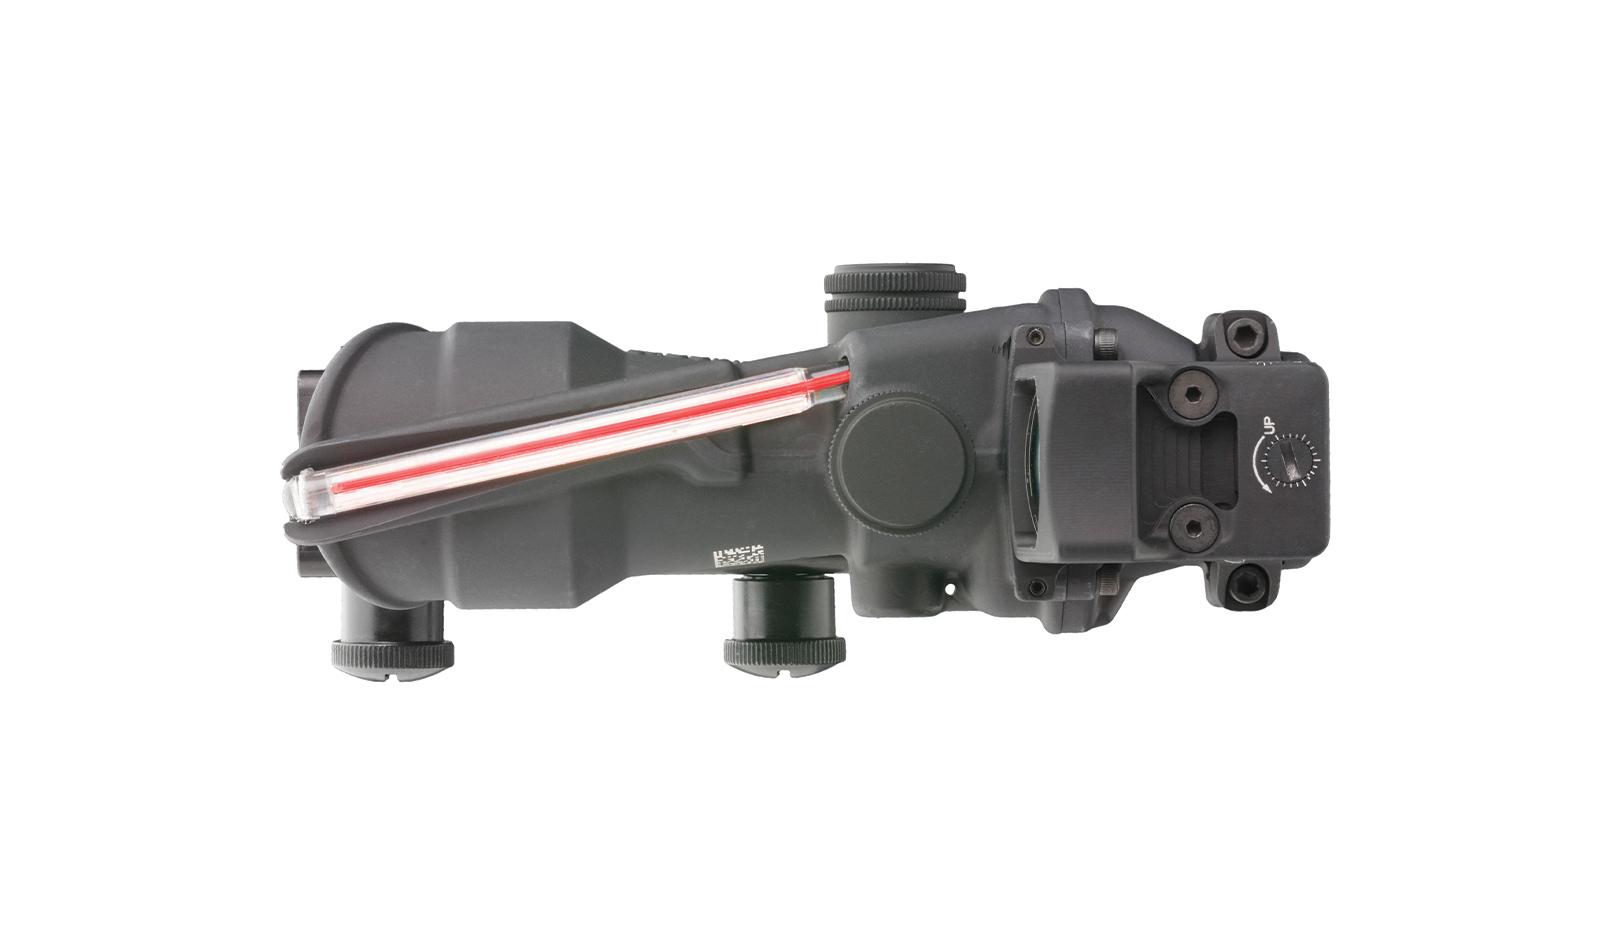 TA31-C-100550 angle 9